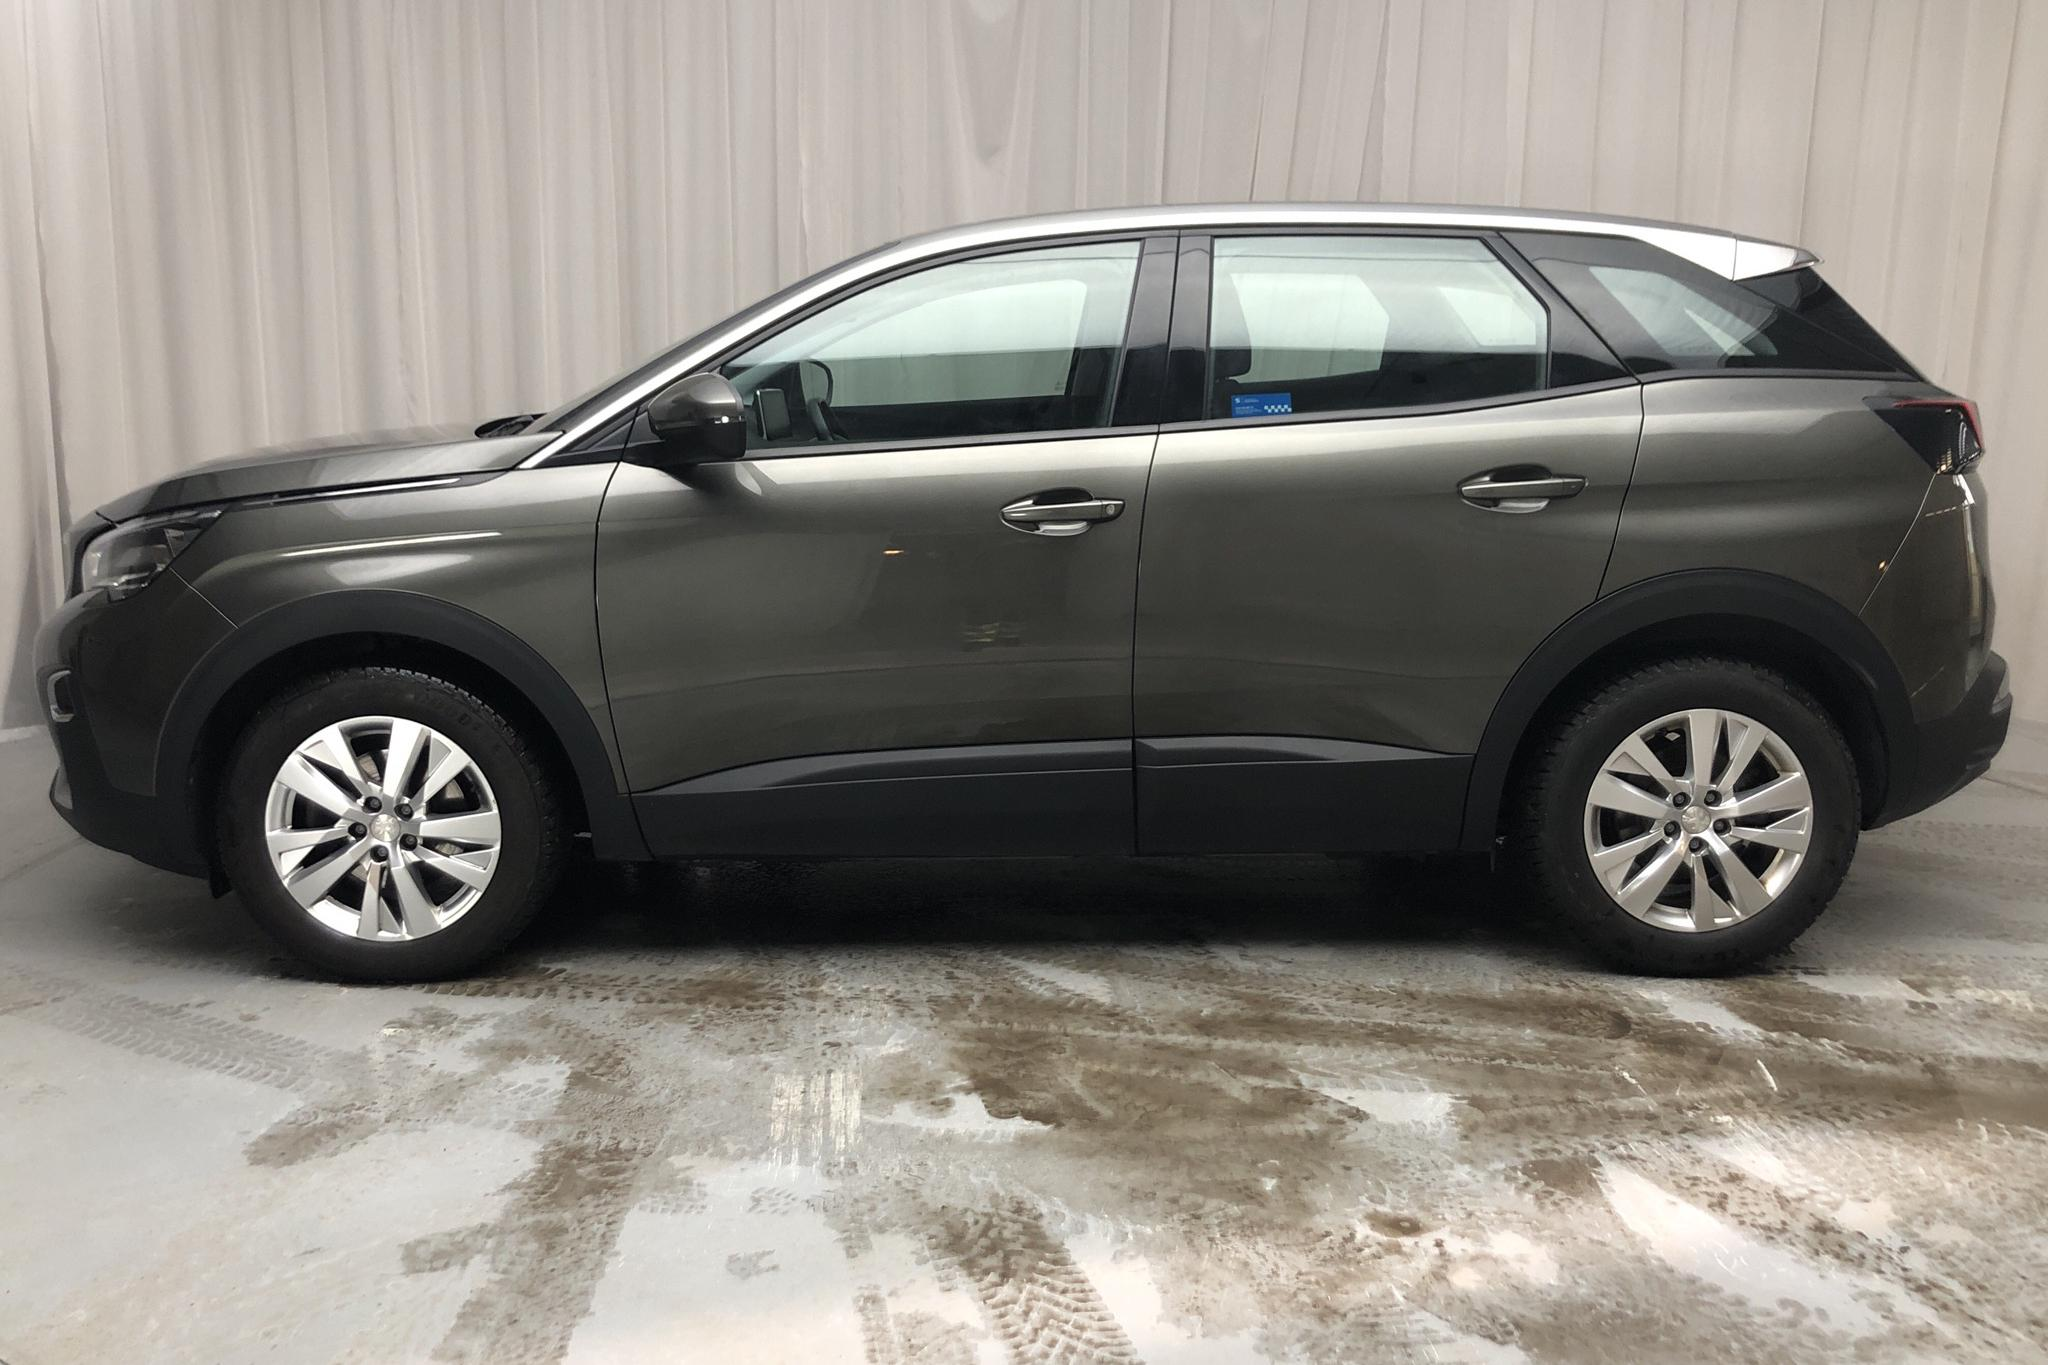 Peugeot 3008 1.2 PureTech (130hk) - 59 510 km - Manual - 2018